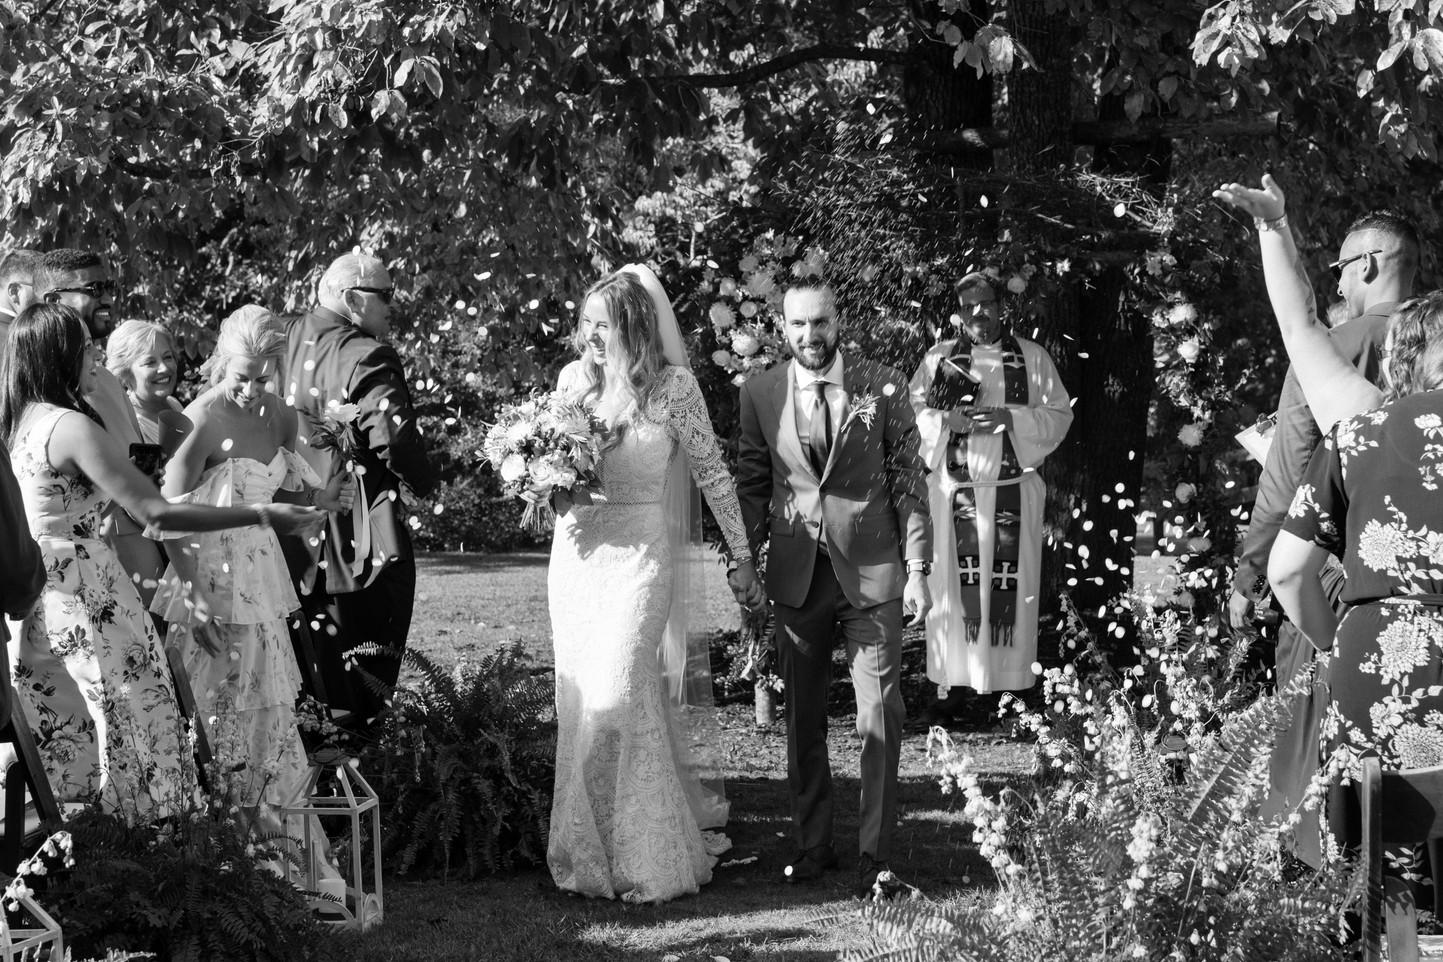 Arlen-Katelyn-Wedding-672.jpg